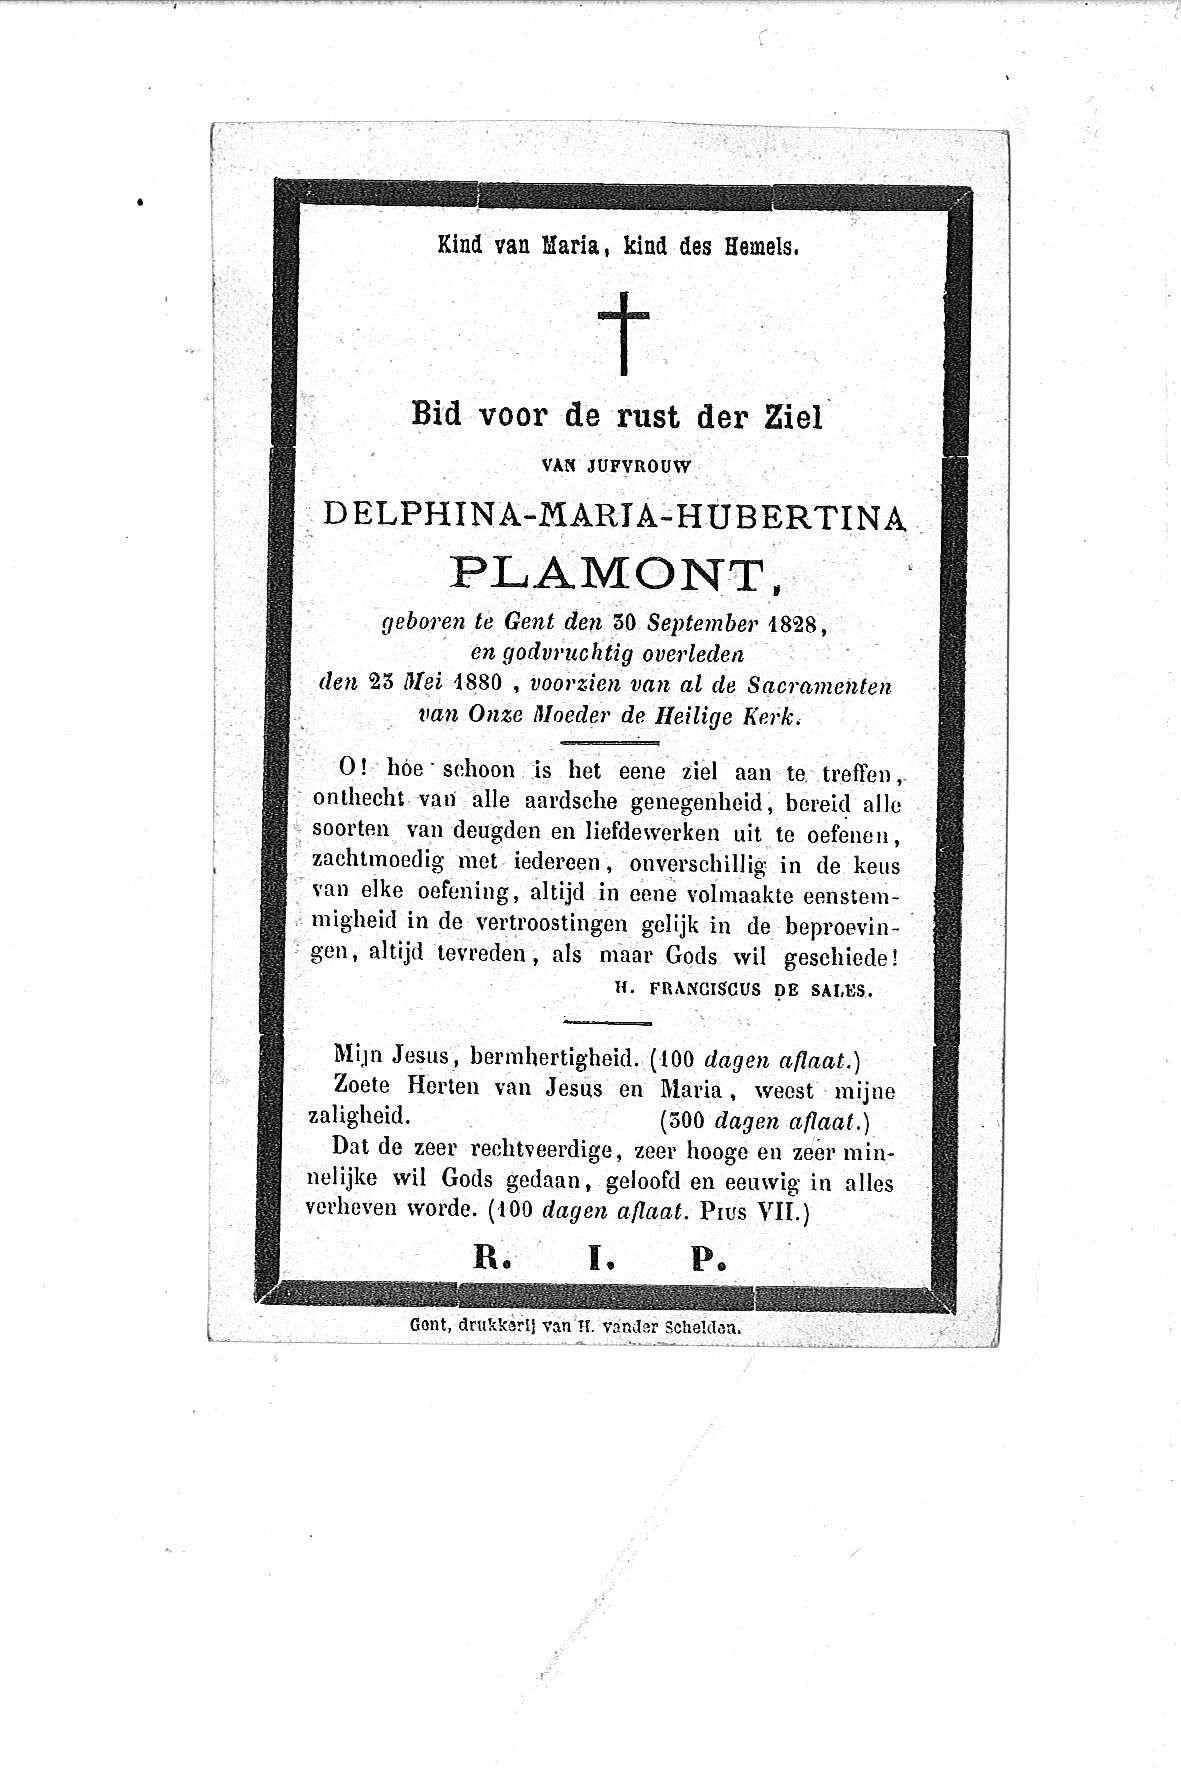 Delphina-Maria-Hubertina(1880)20100415104824_00027.jpg